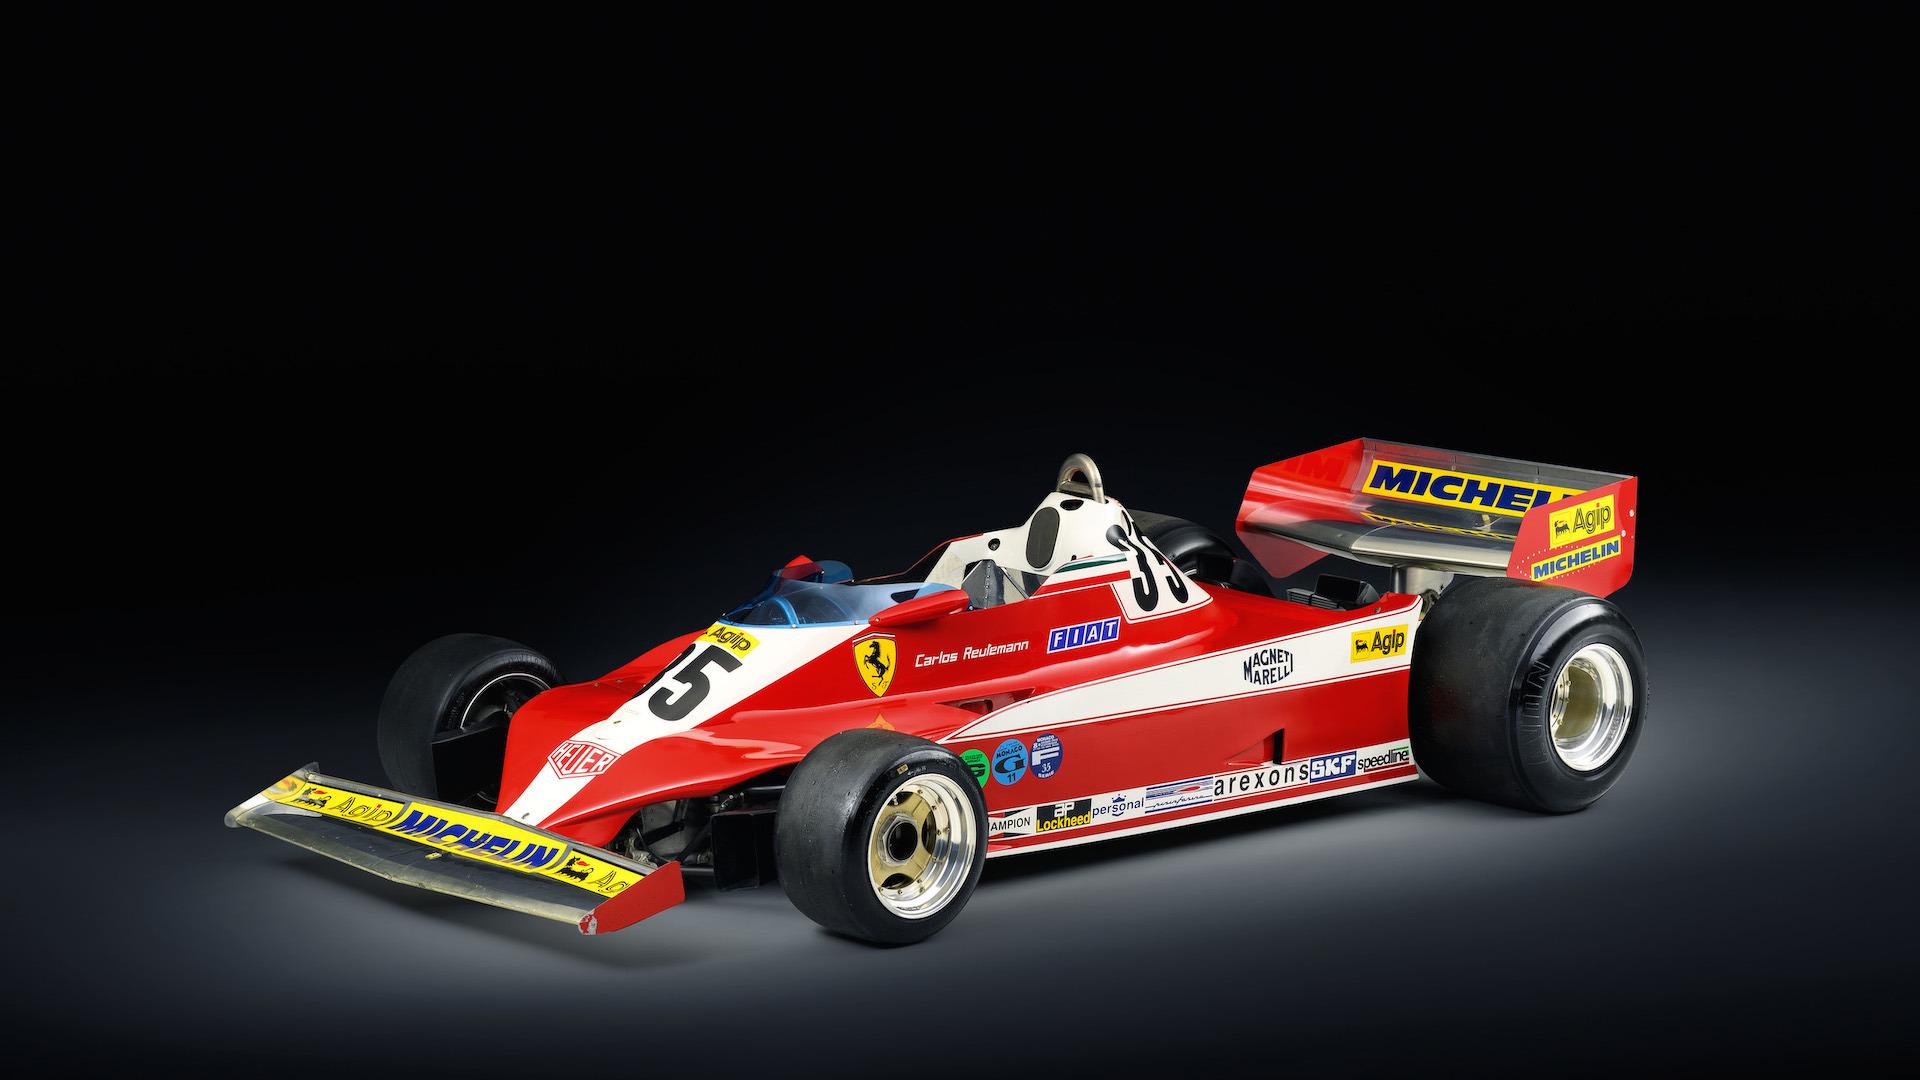 Carlos Reutemanns Ferrari 312T Is Up For Sale